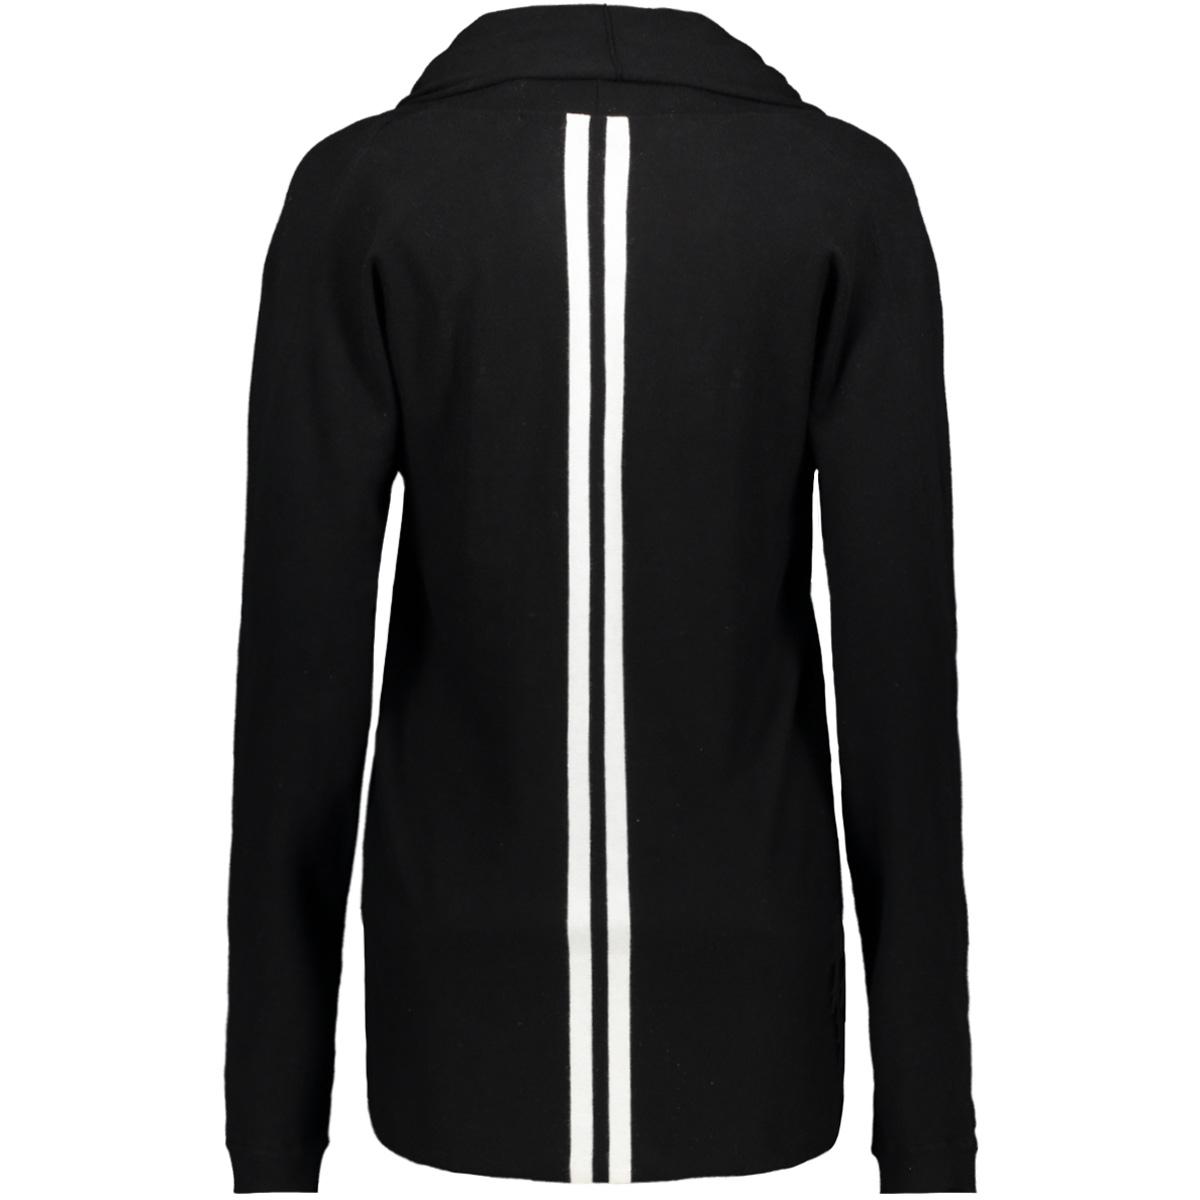 206509101 10 days vest black